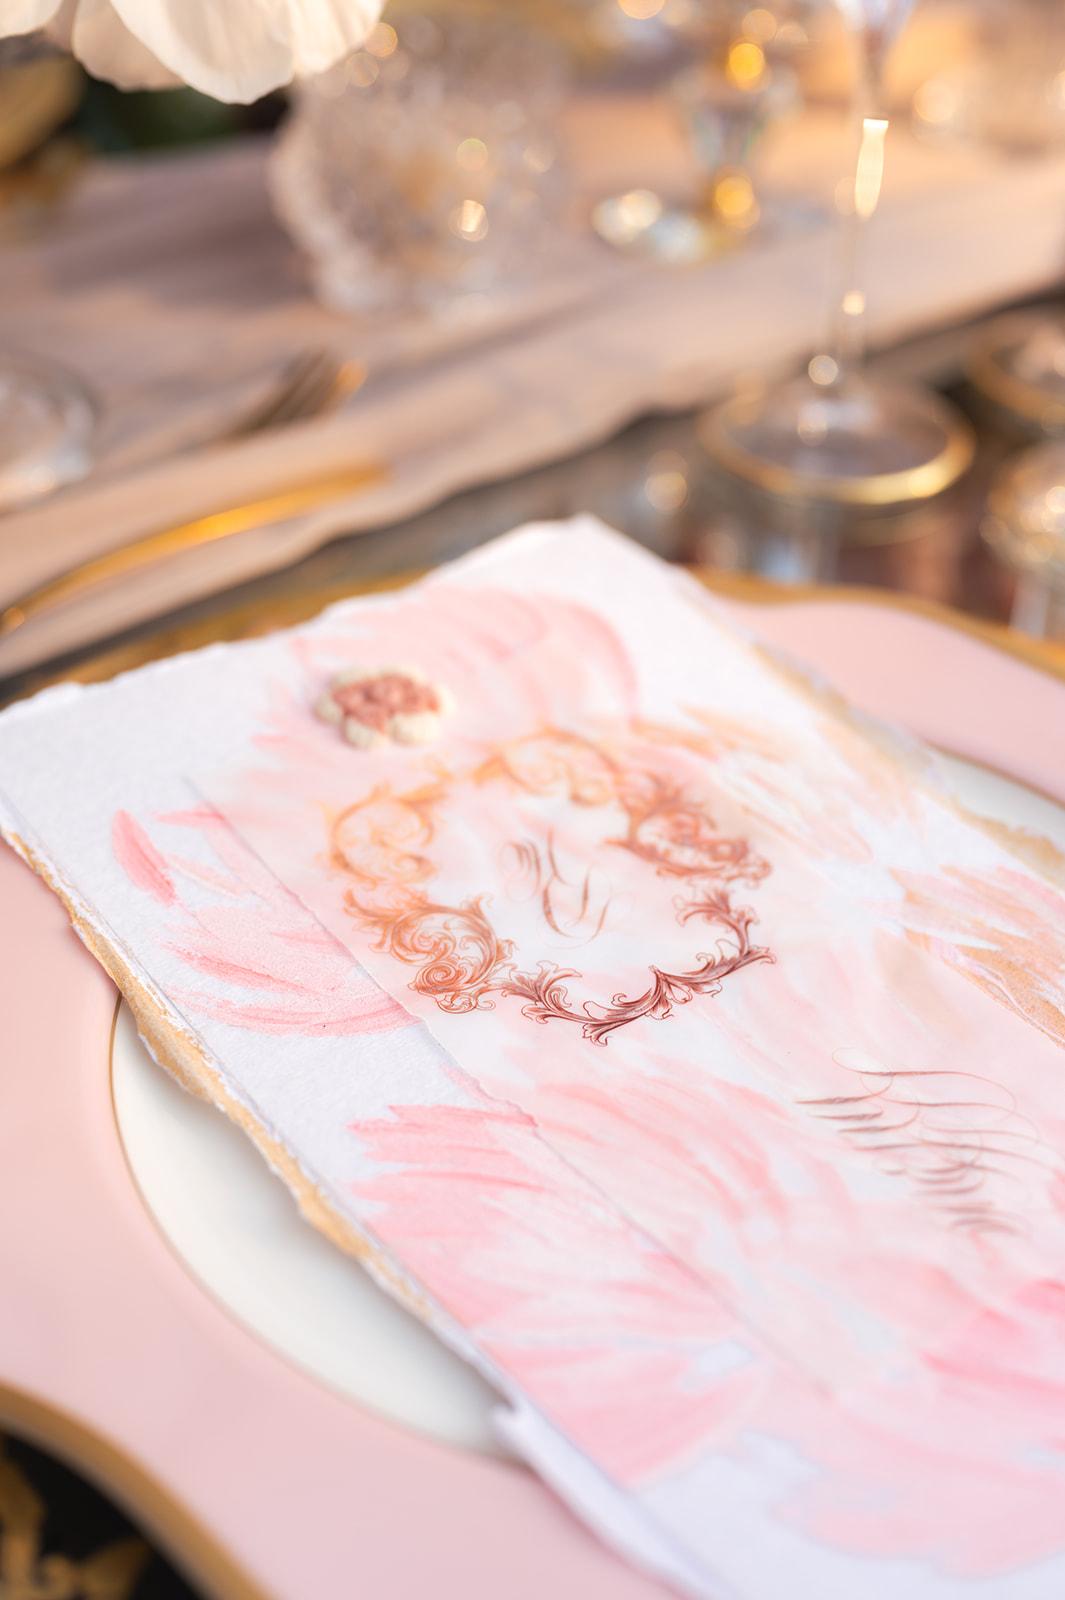 Floral inspired hand painted blush wedding menu design